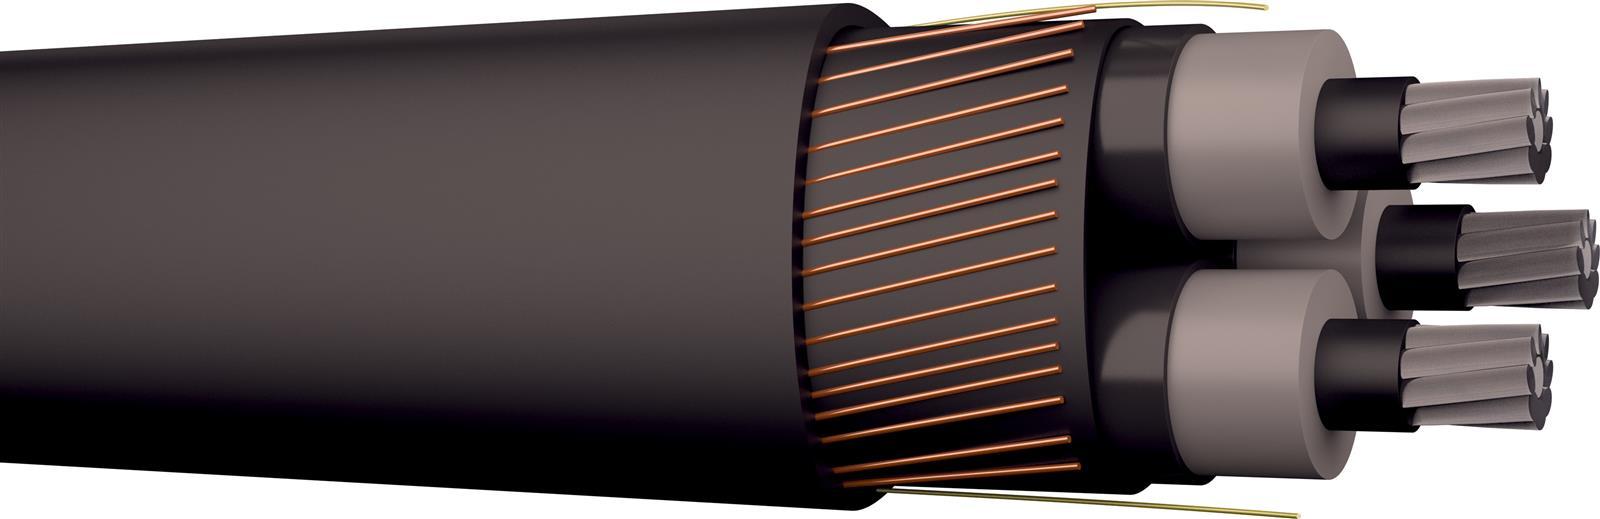 AXLJ-RMF 3X240/35 36KV T500/K2